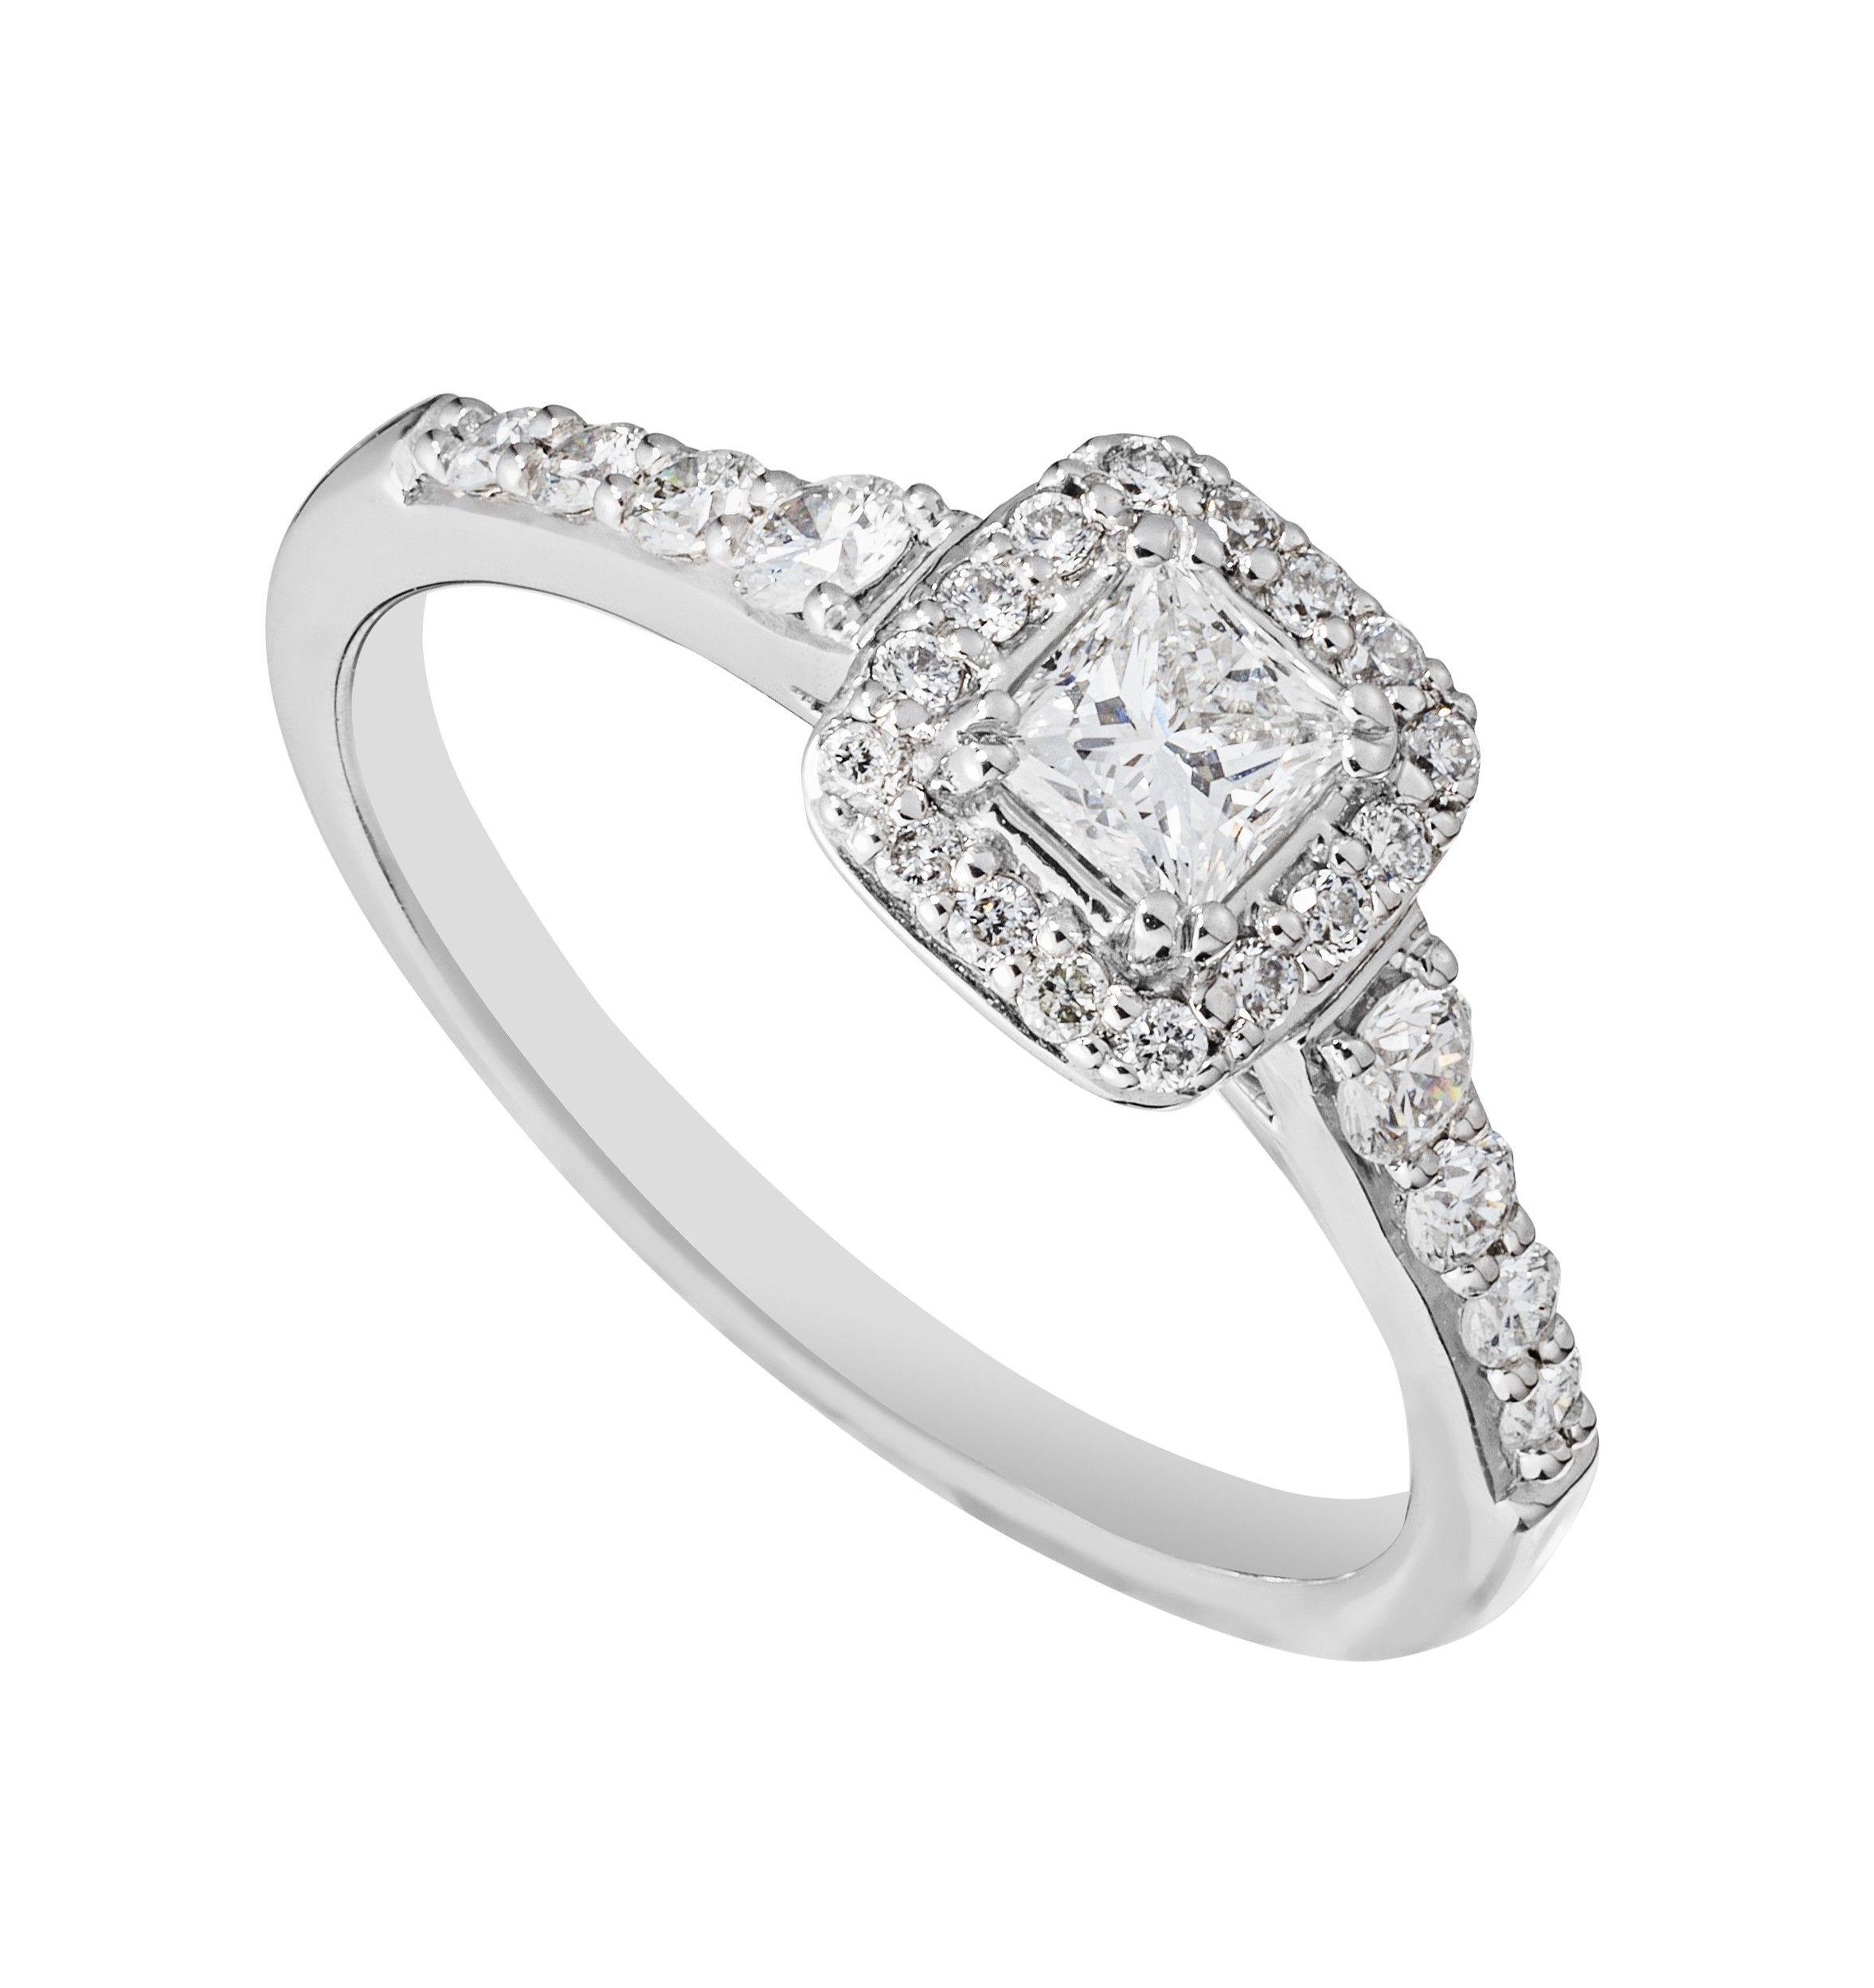 18ct White Gold 050 Carat Princess Cut Diamond Cluster Ring